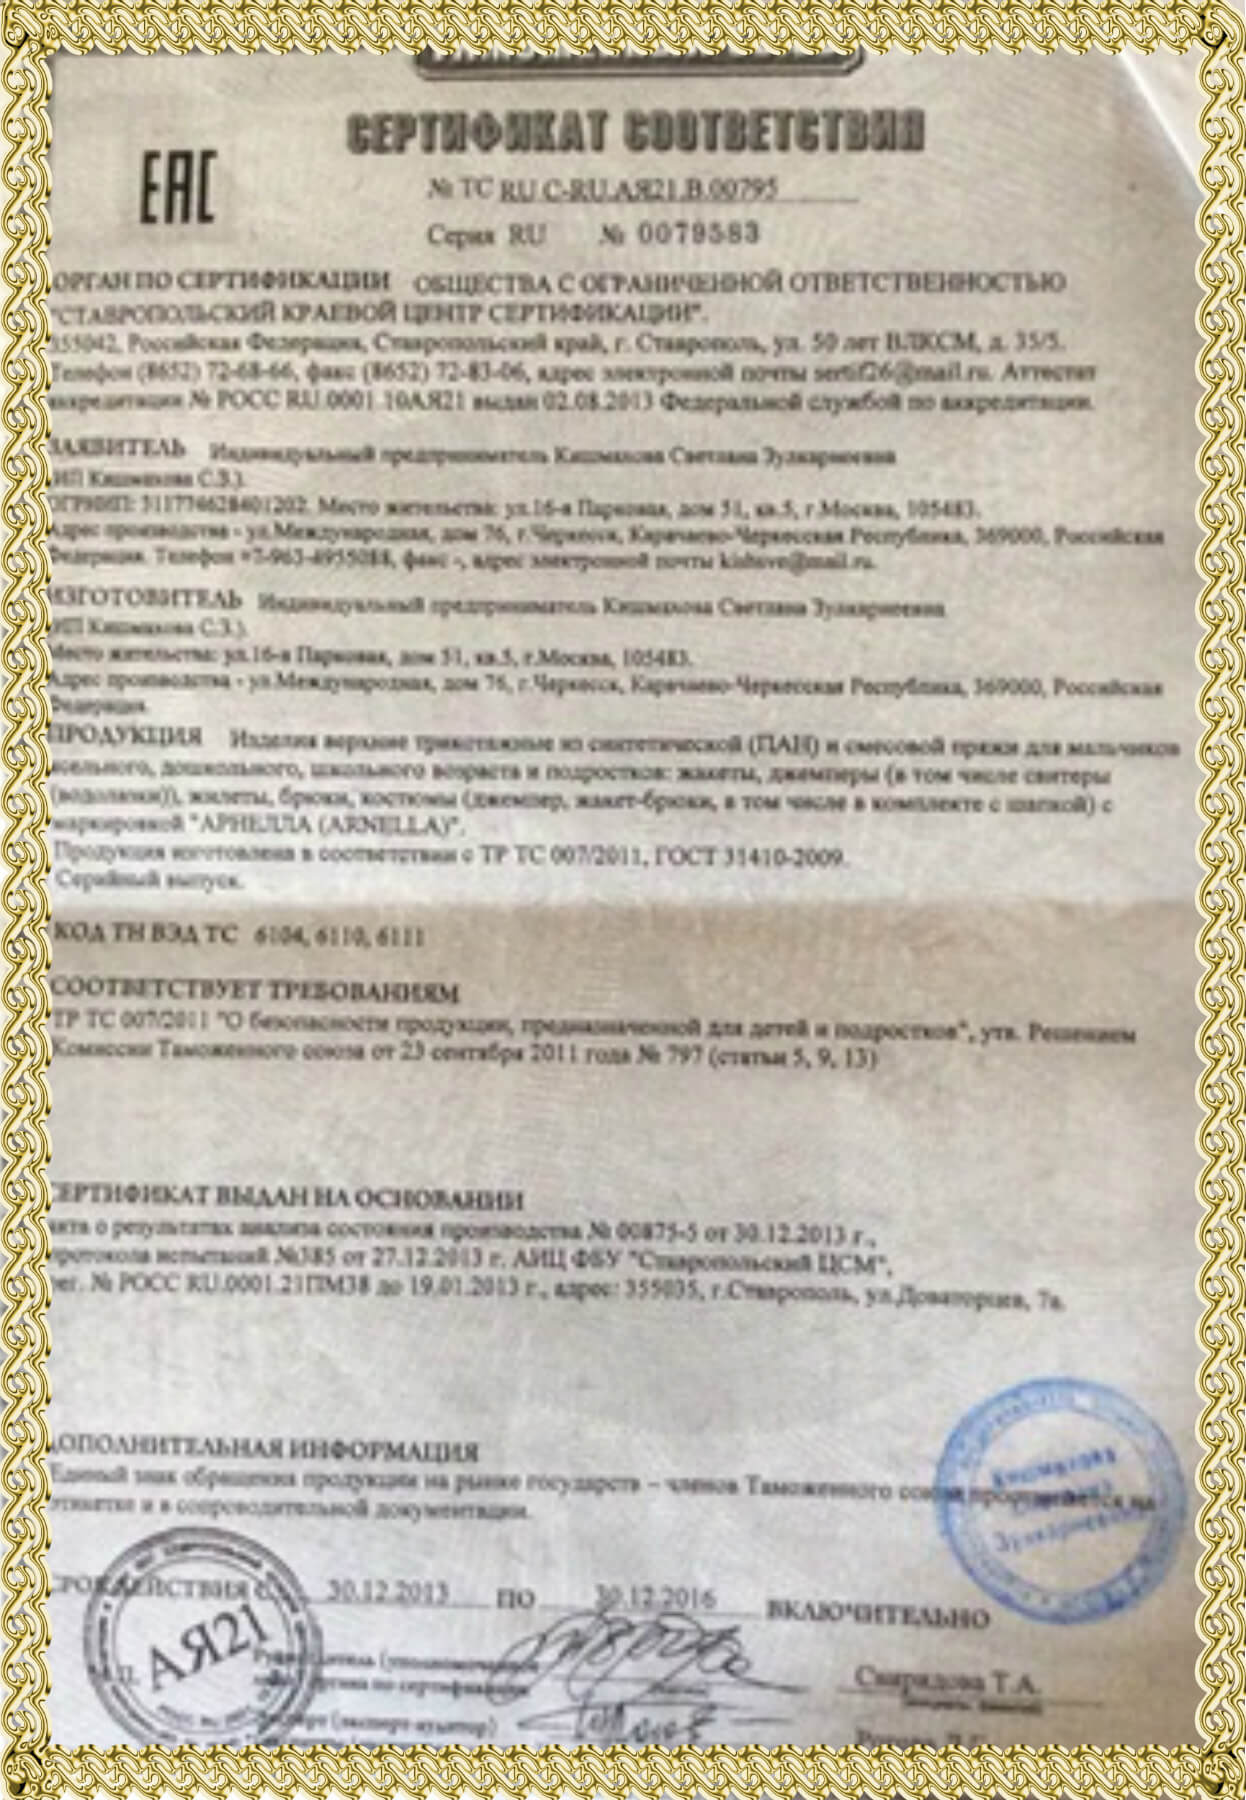 sertificat_kachestva7-__1_.jpg